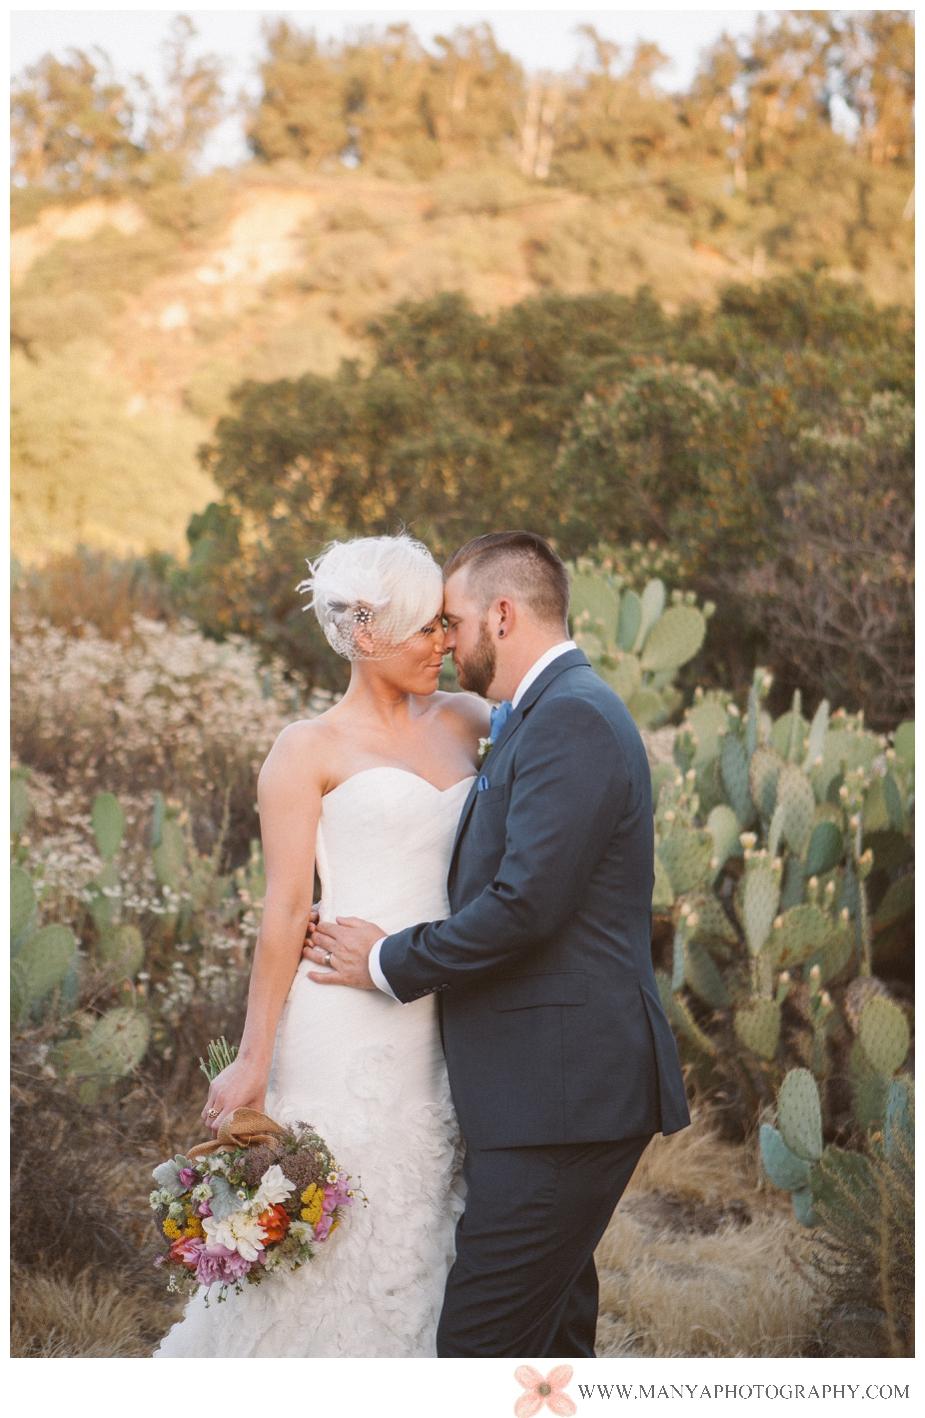 2013-08-15_0116 - Orange County Wedding Photographer